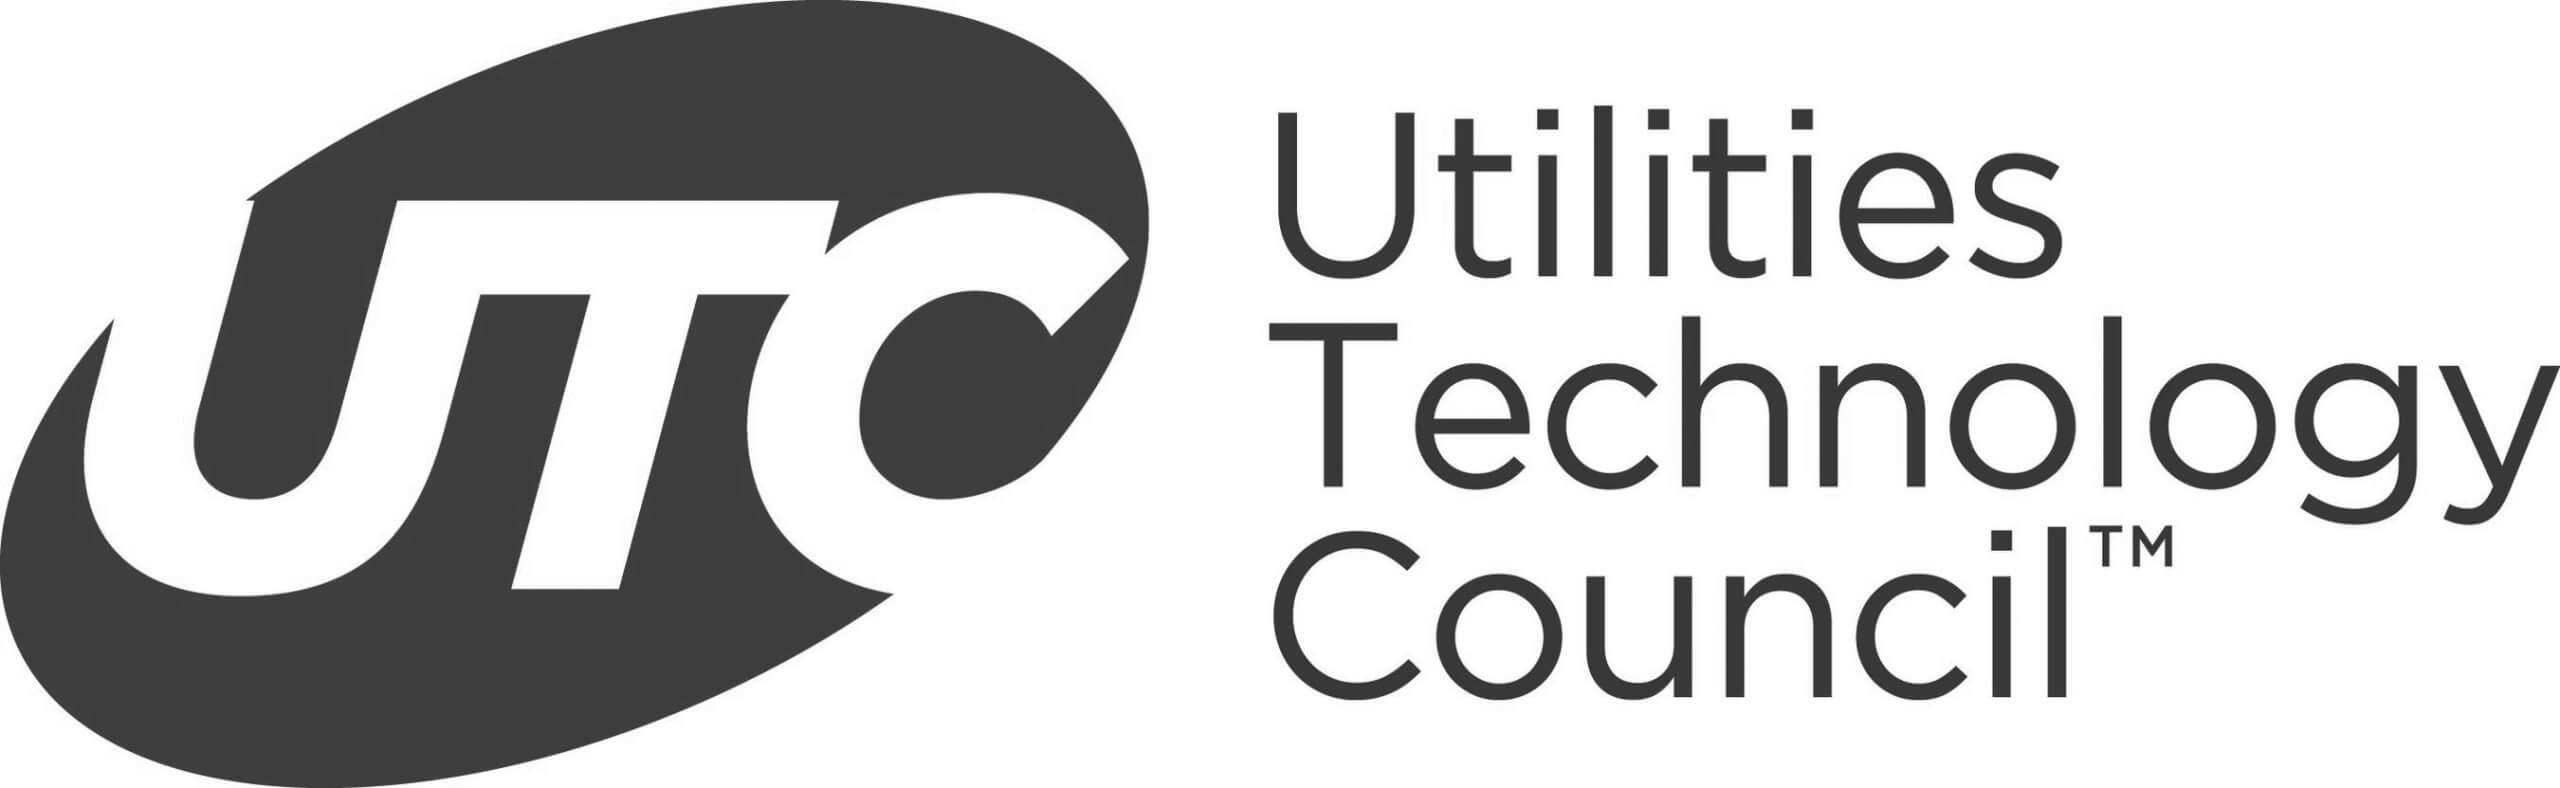 Utilities Technology Council logo